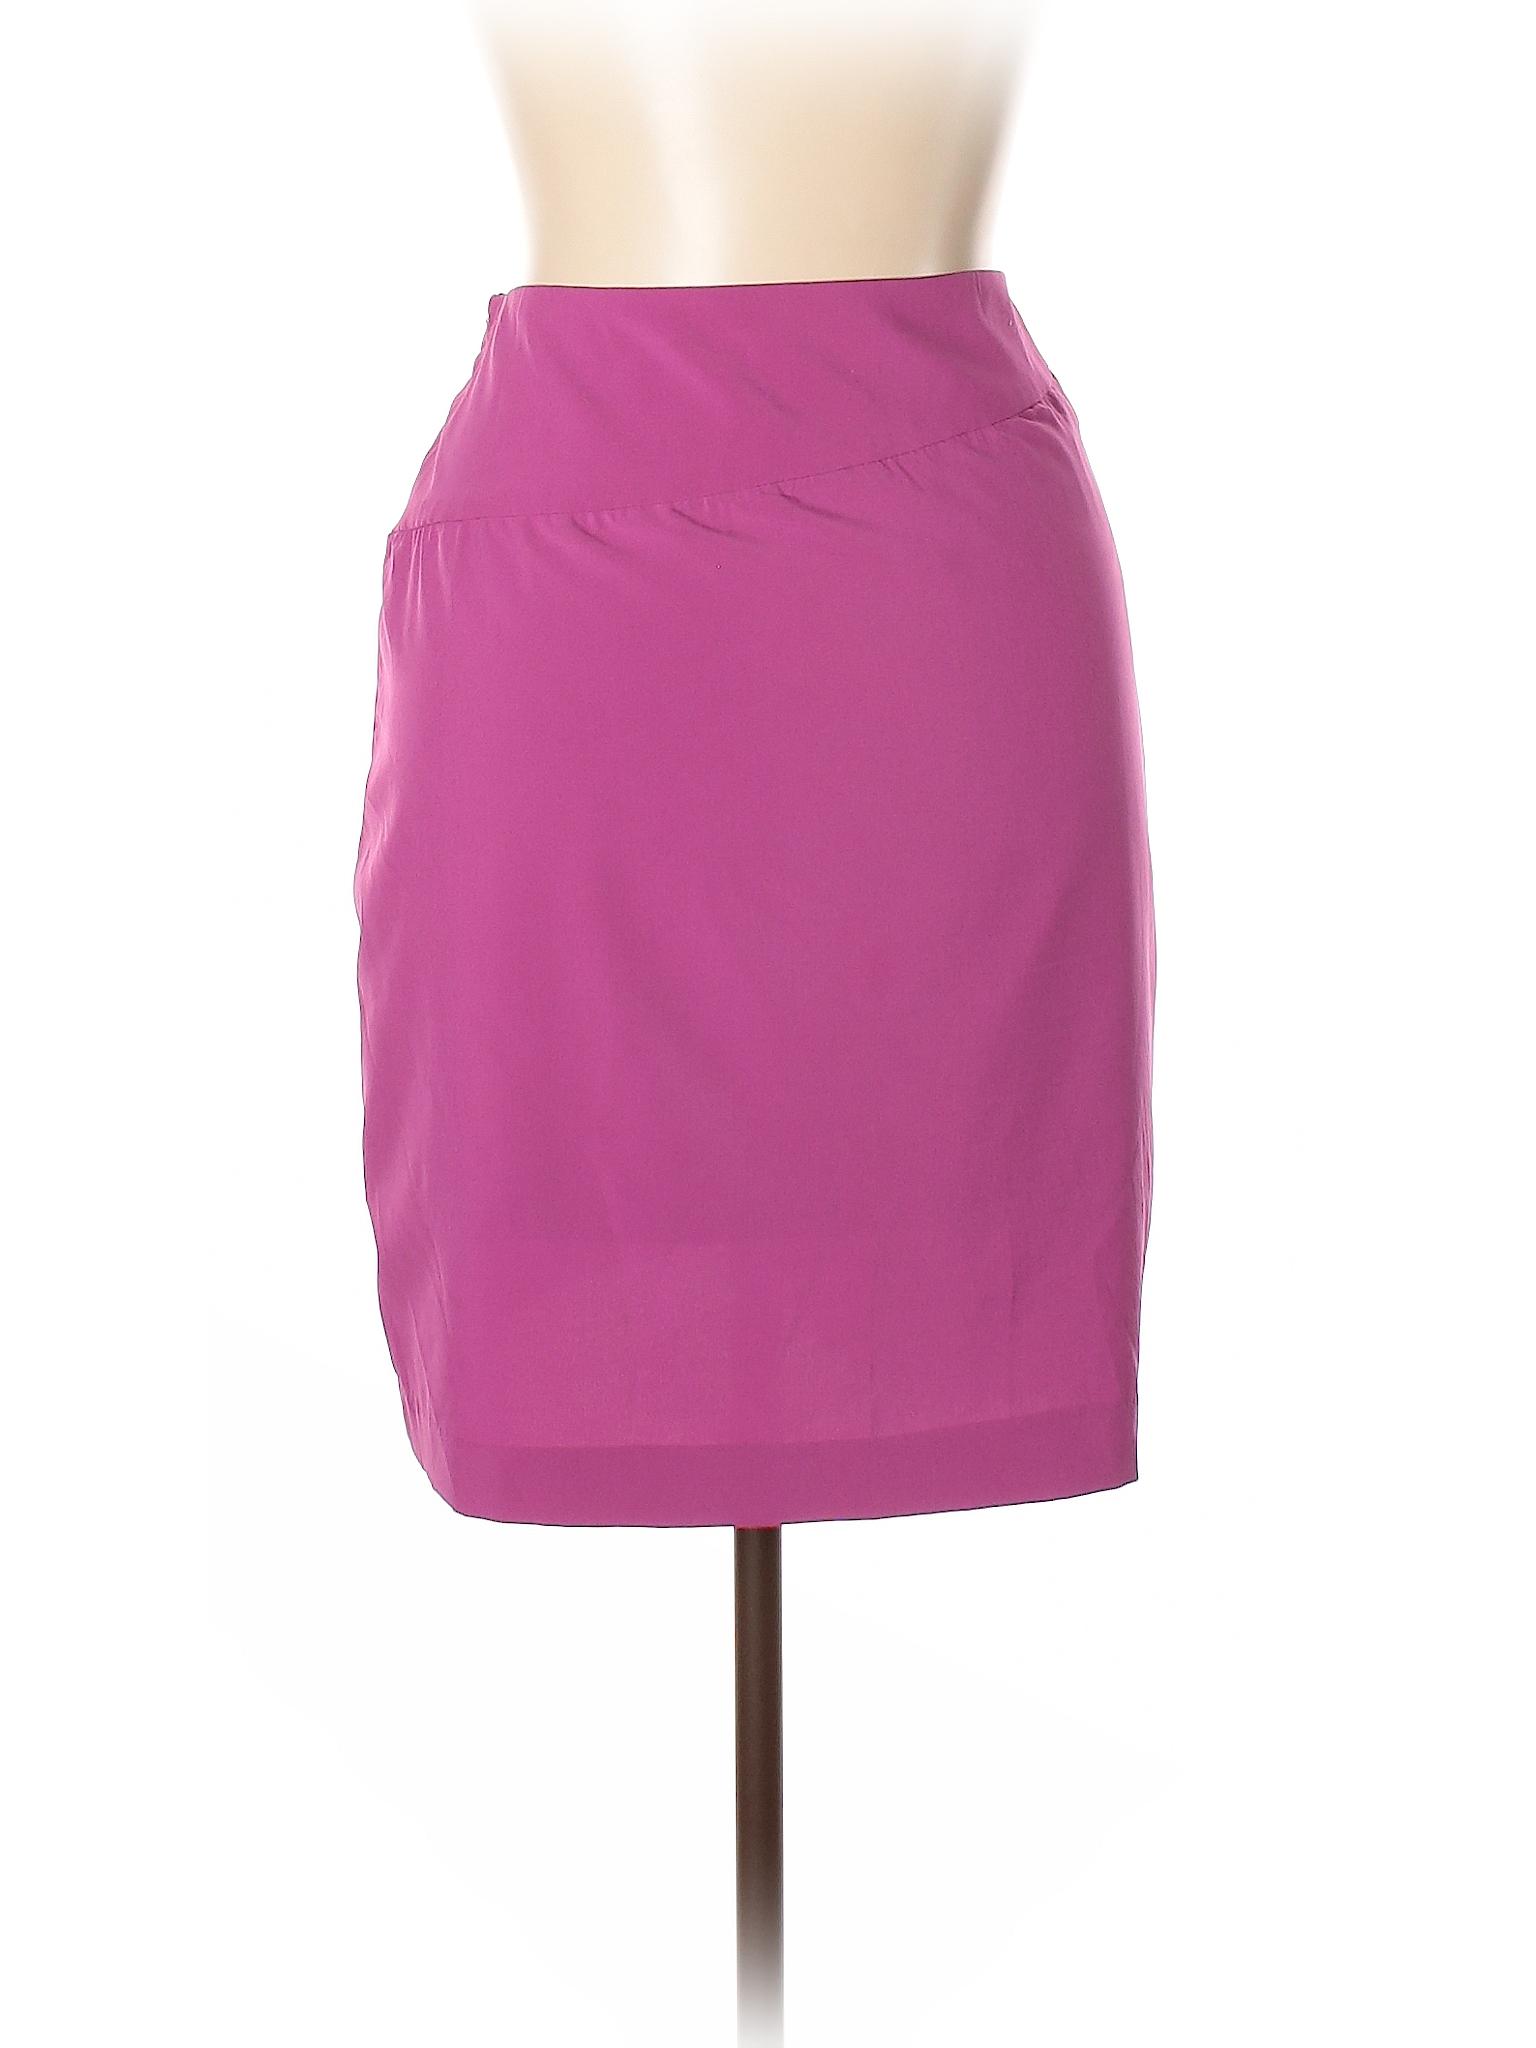 21 Boutique Skirt Love Love Boutique Casual nB8w0